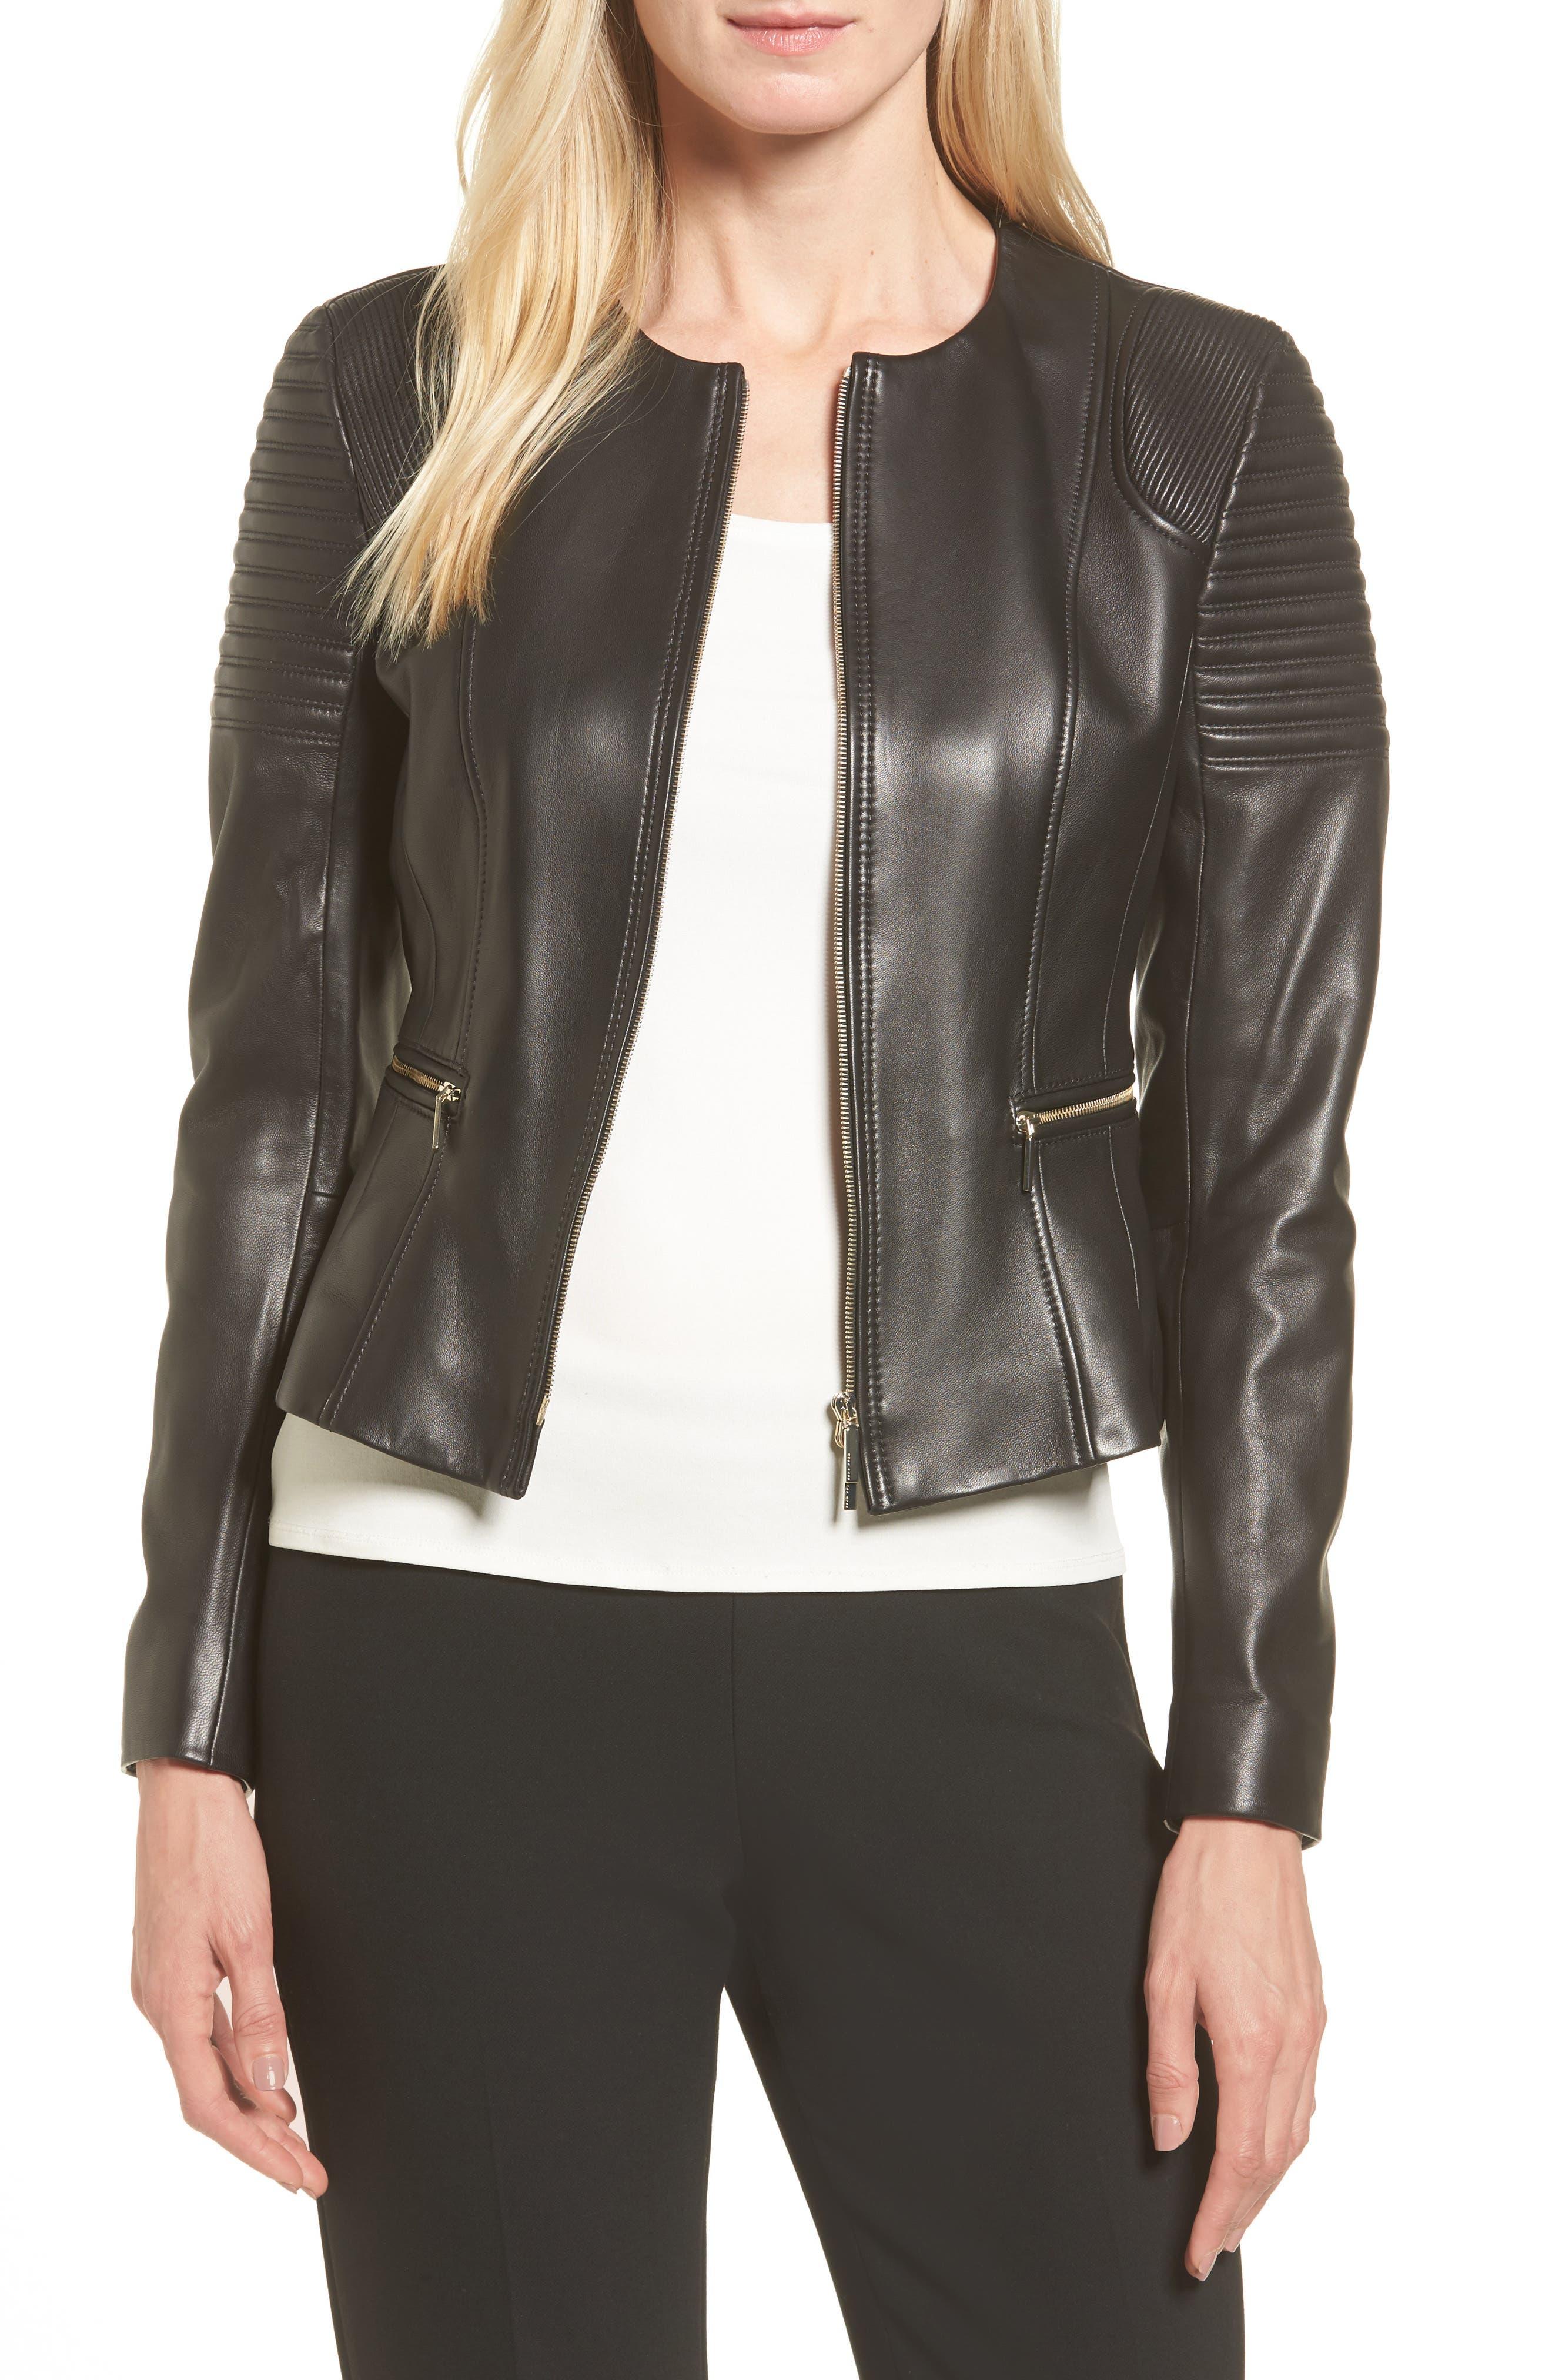 Sakumaya Leather Jacket,                         Main,                         color, Black